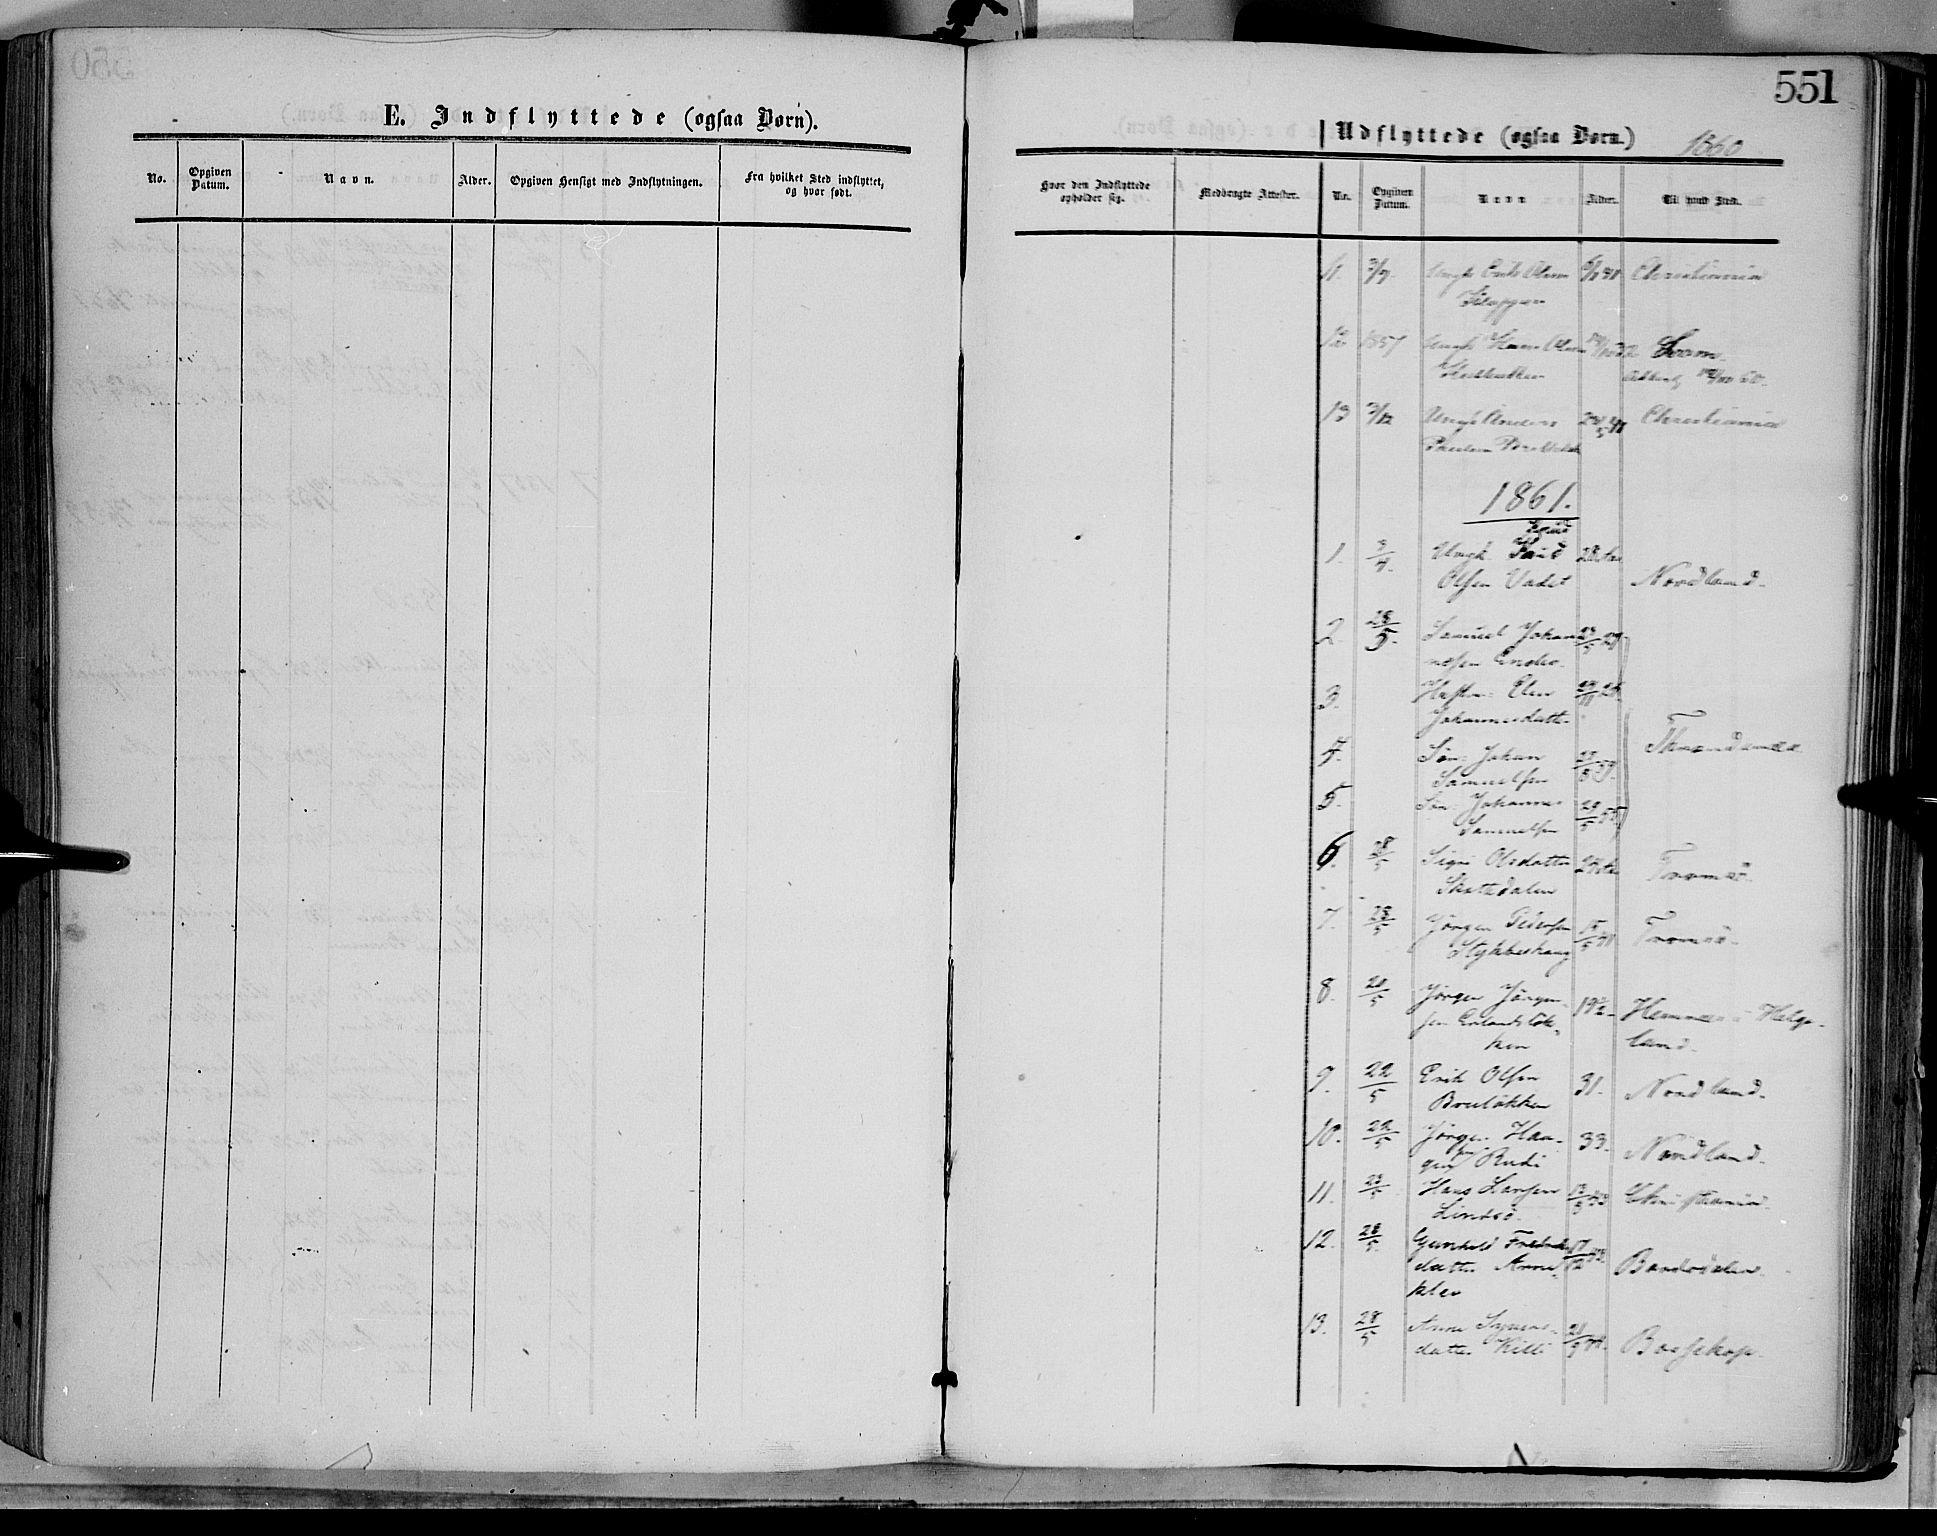 SAH, Dovre prestekontor, Parish register (official) no. 1, 1854-1878, p. 551